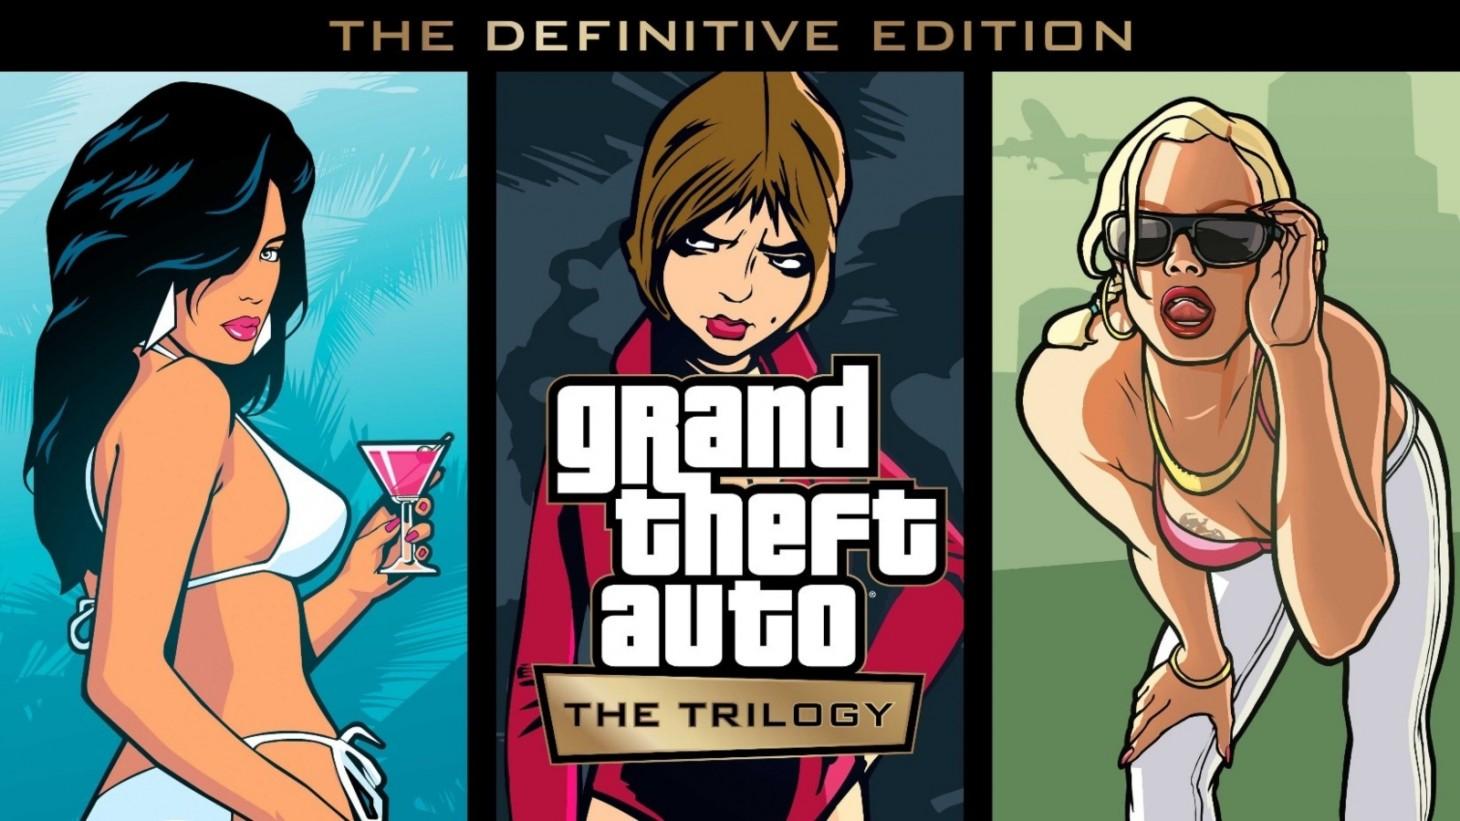 grand_theft_auto_the_trilogy_art.jpg